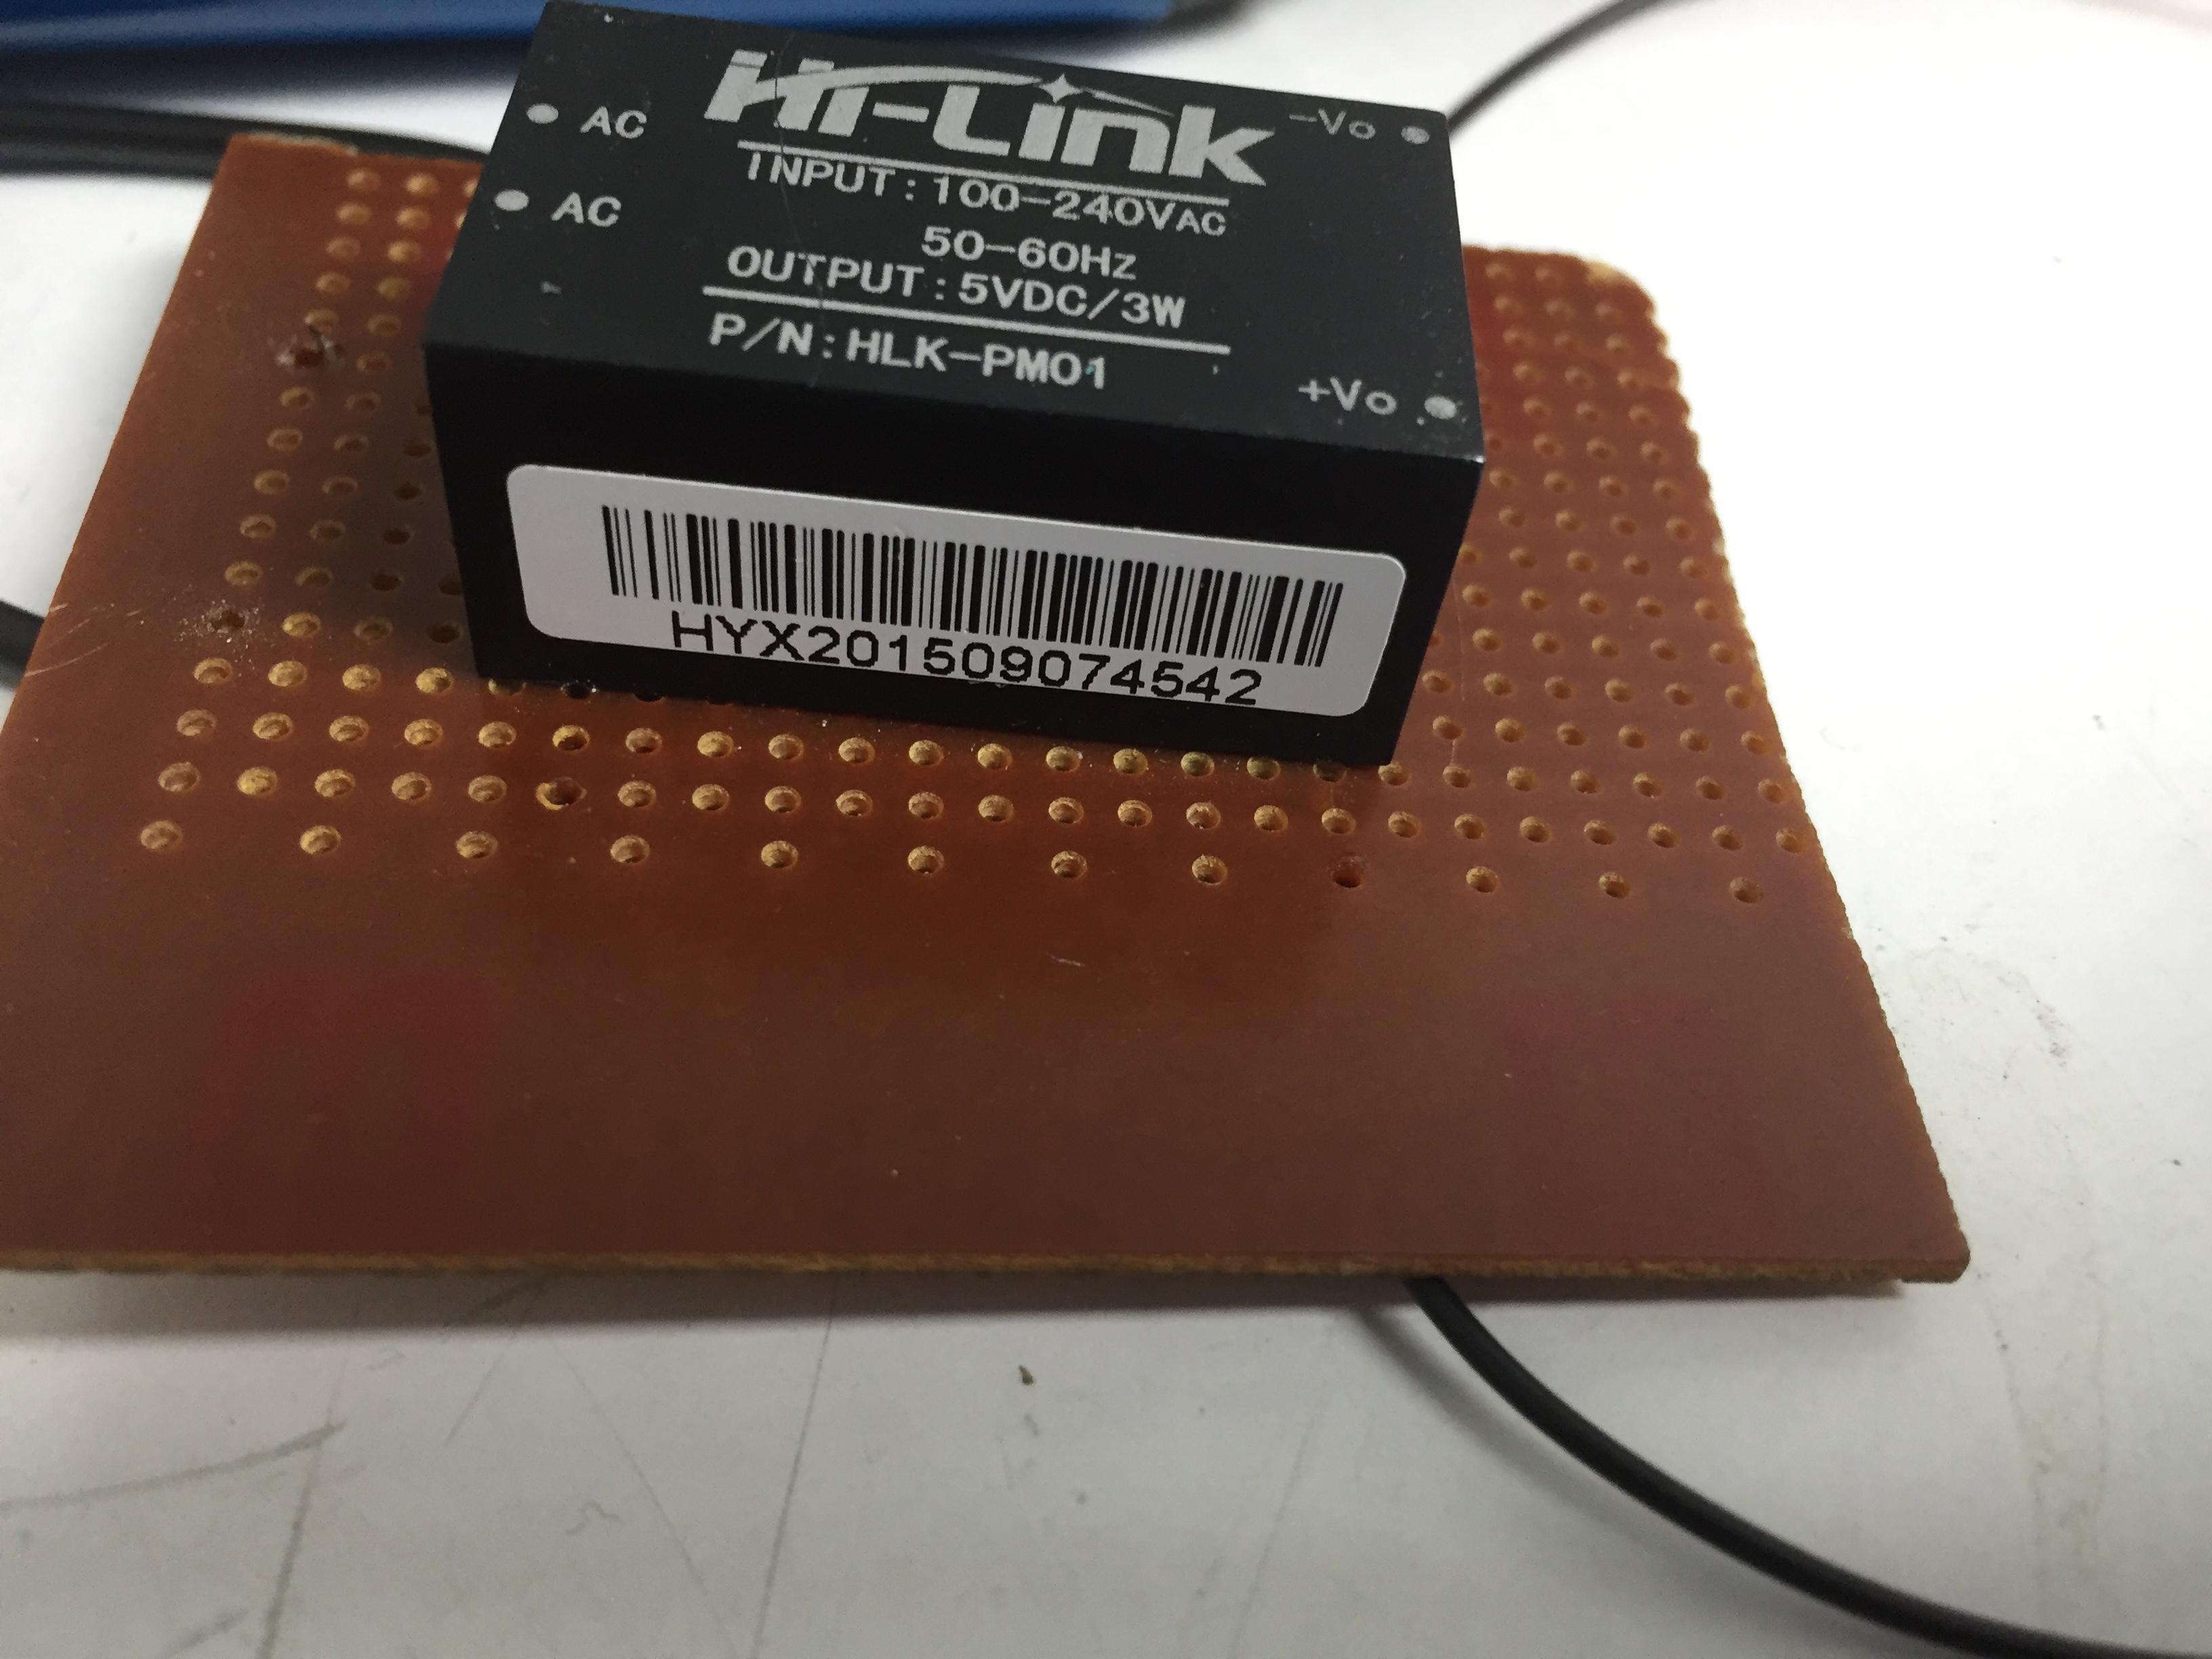 HLK-PM01 Barcode